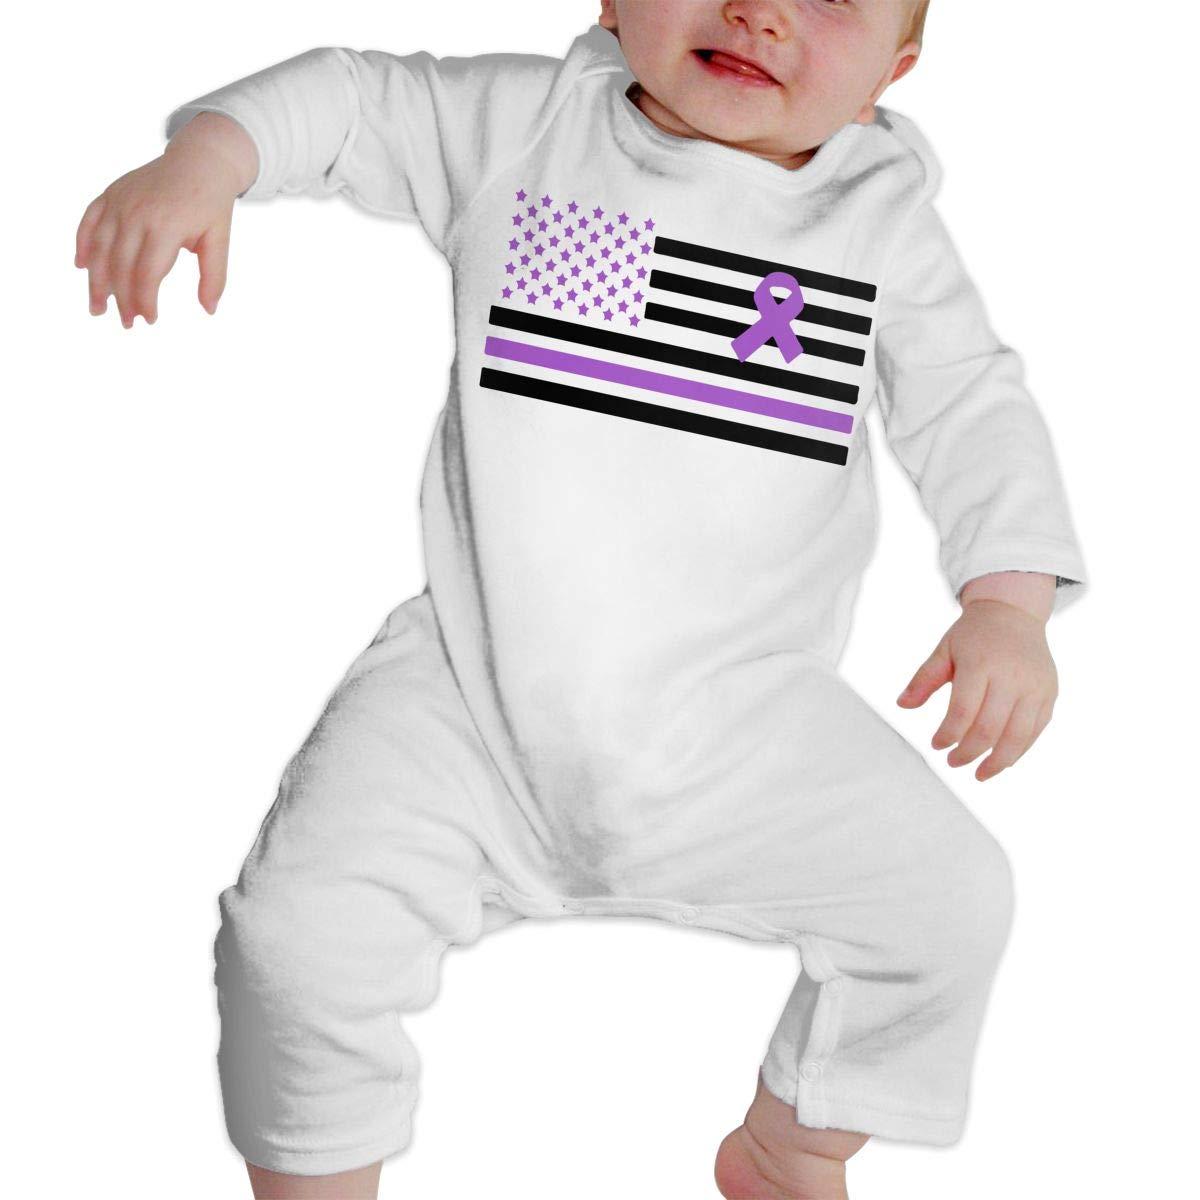 LBJQ8 Epilepsy Awareness Newborn Infant Baby Girls Soft /& Breathable Jumpsuit Overall Romper